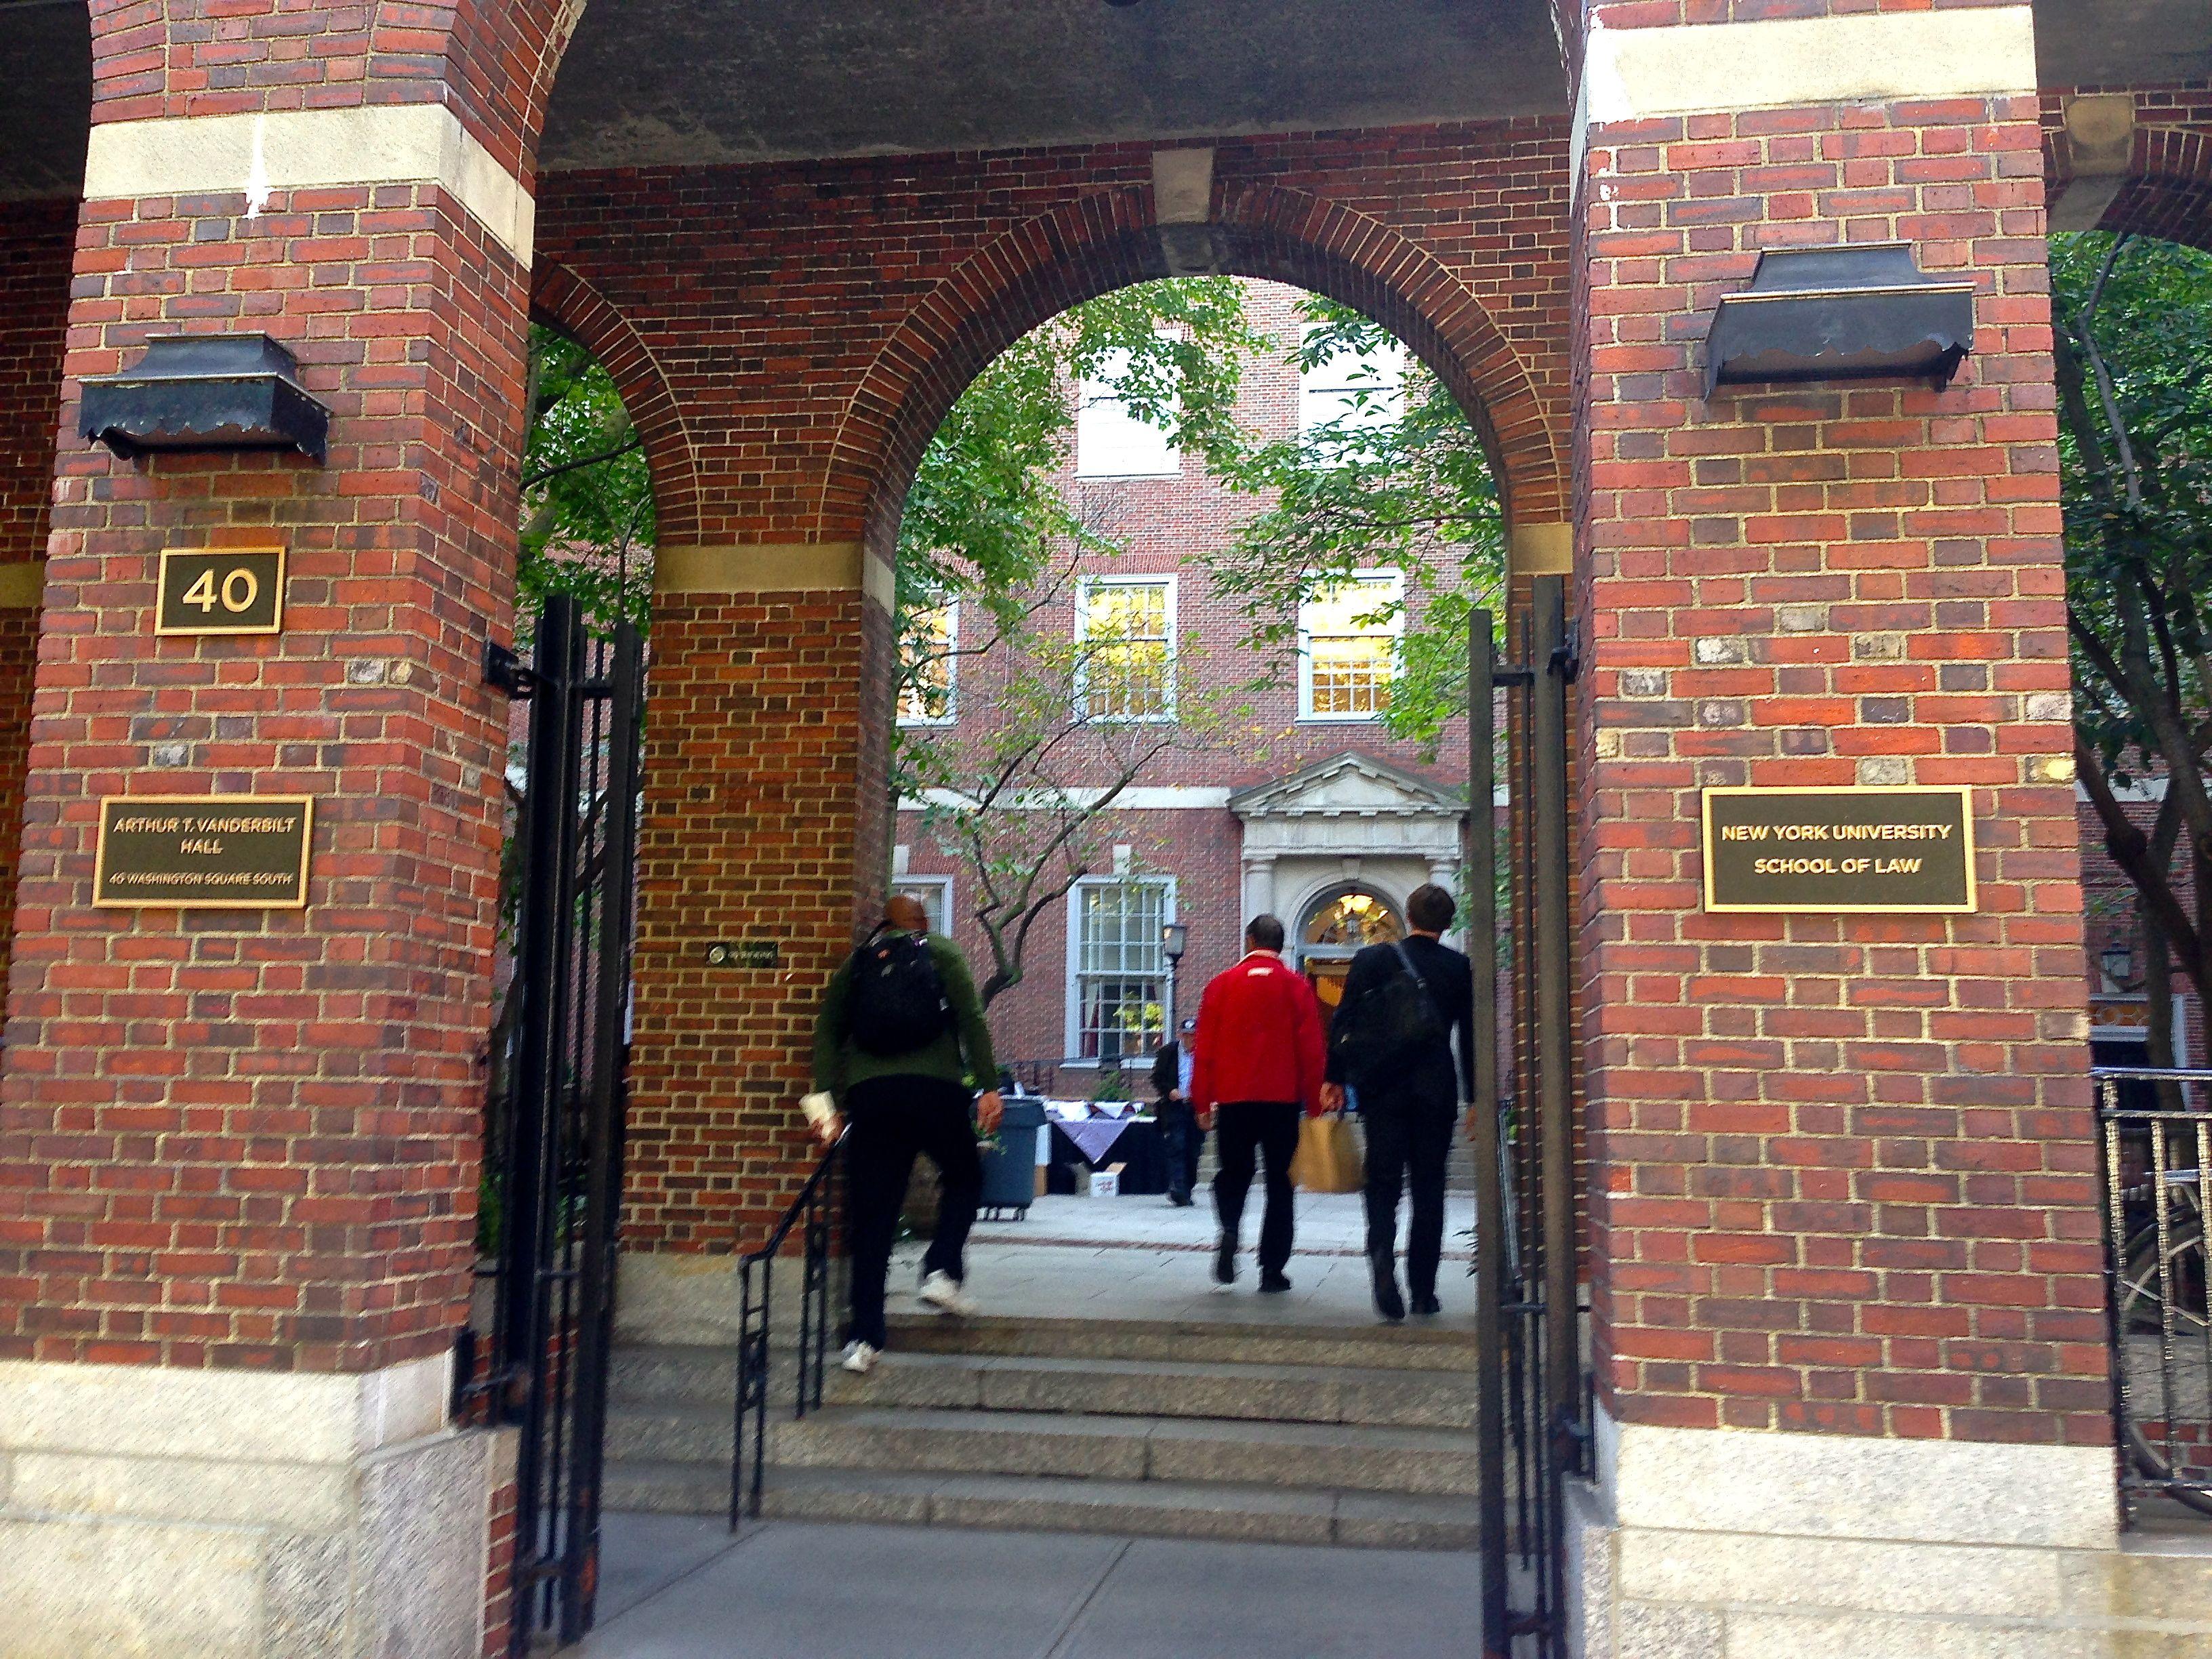 About Nyu Law Nyu School Of Law Law School Nyu Law York University